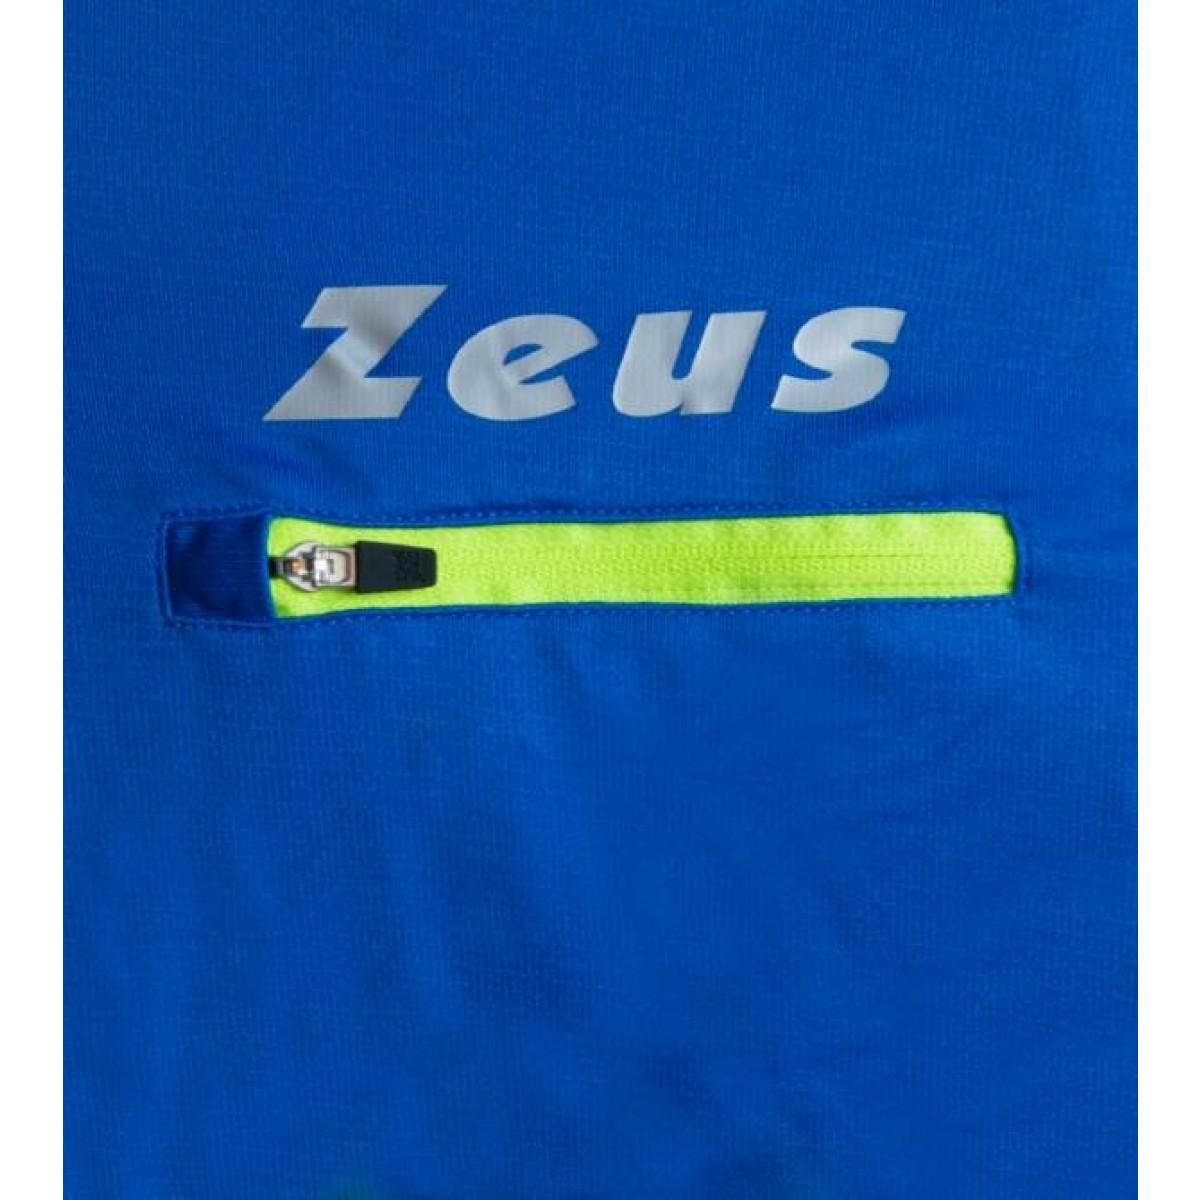 Zeus Atlante kortaermet loebetroeje blaa neon gul hvid